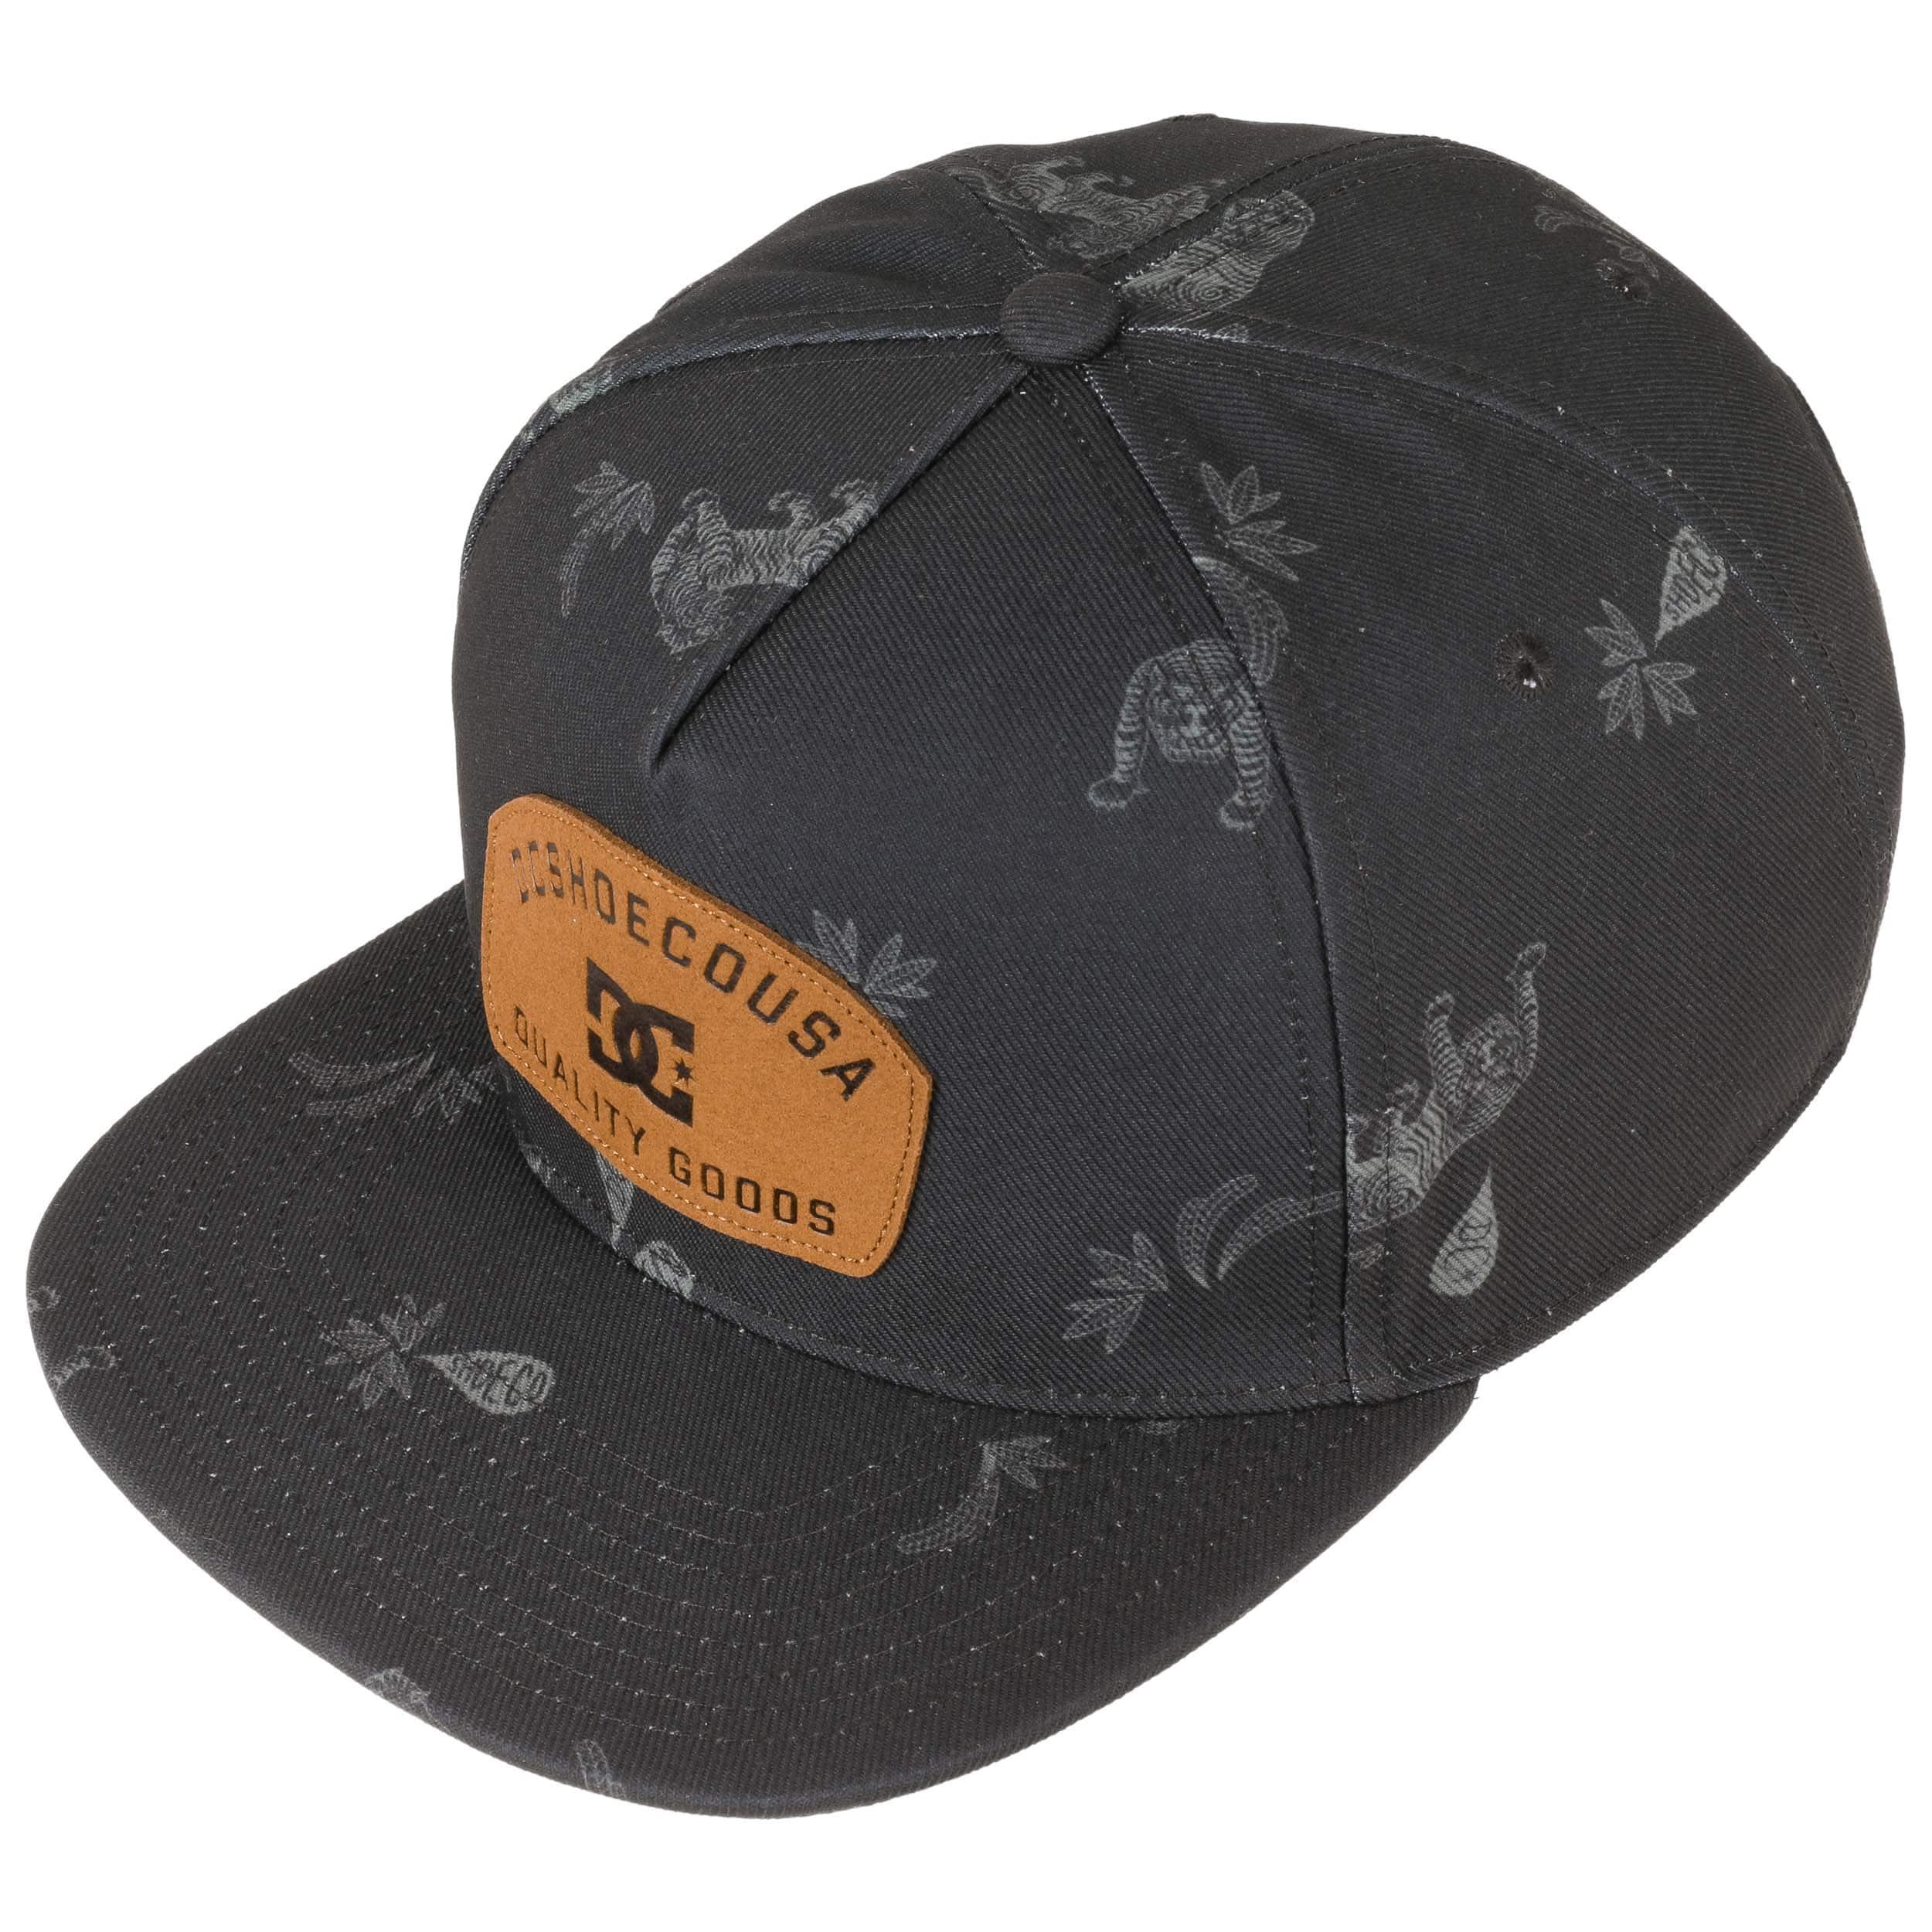 Betterman Snapback Cap by DC Shoes Co - black 1 ... 814066cd52f9